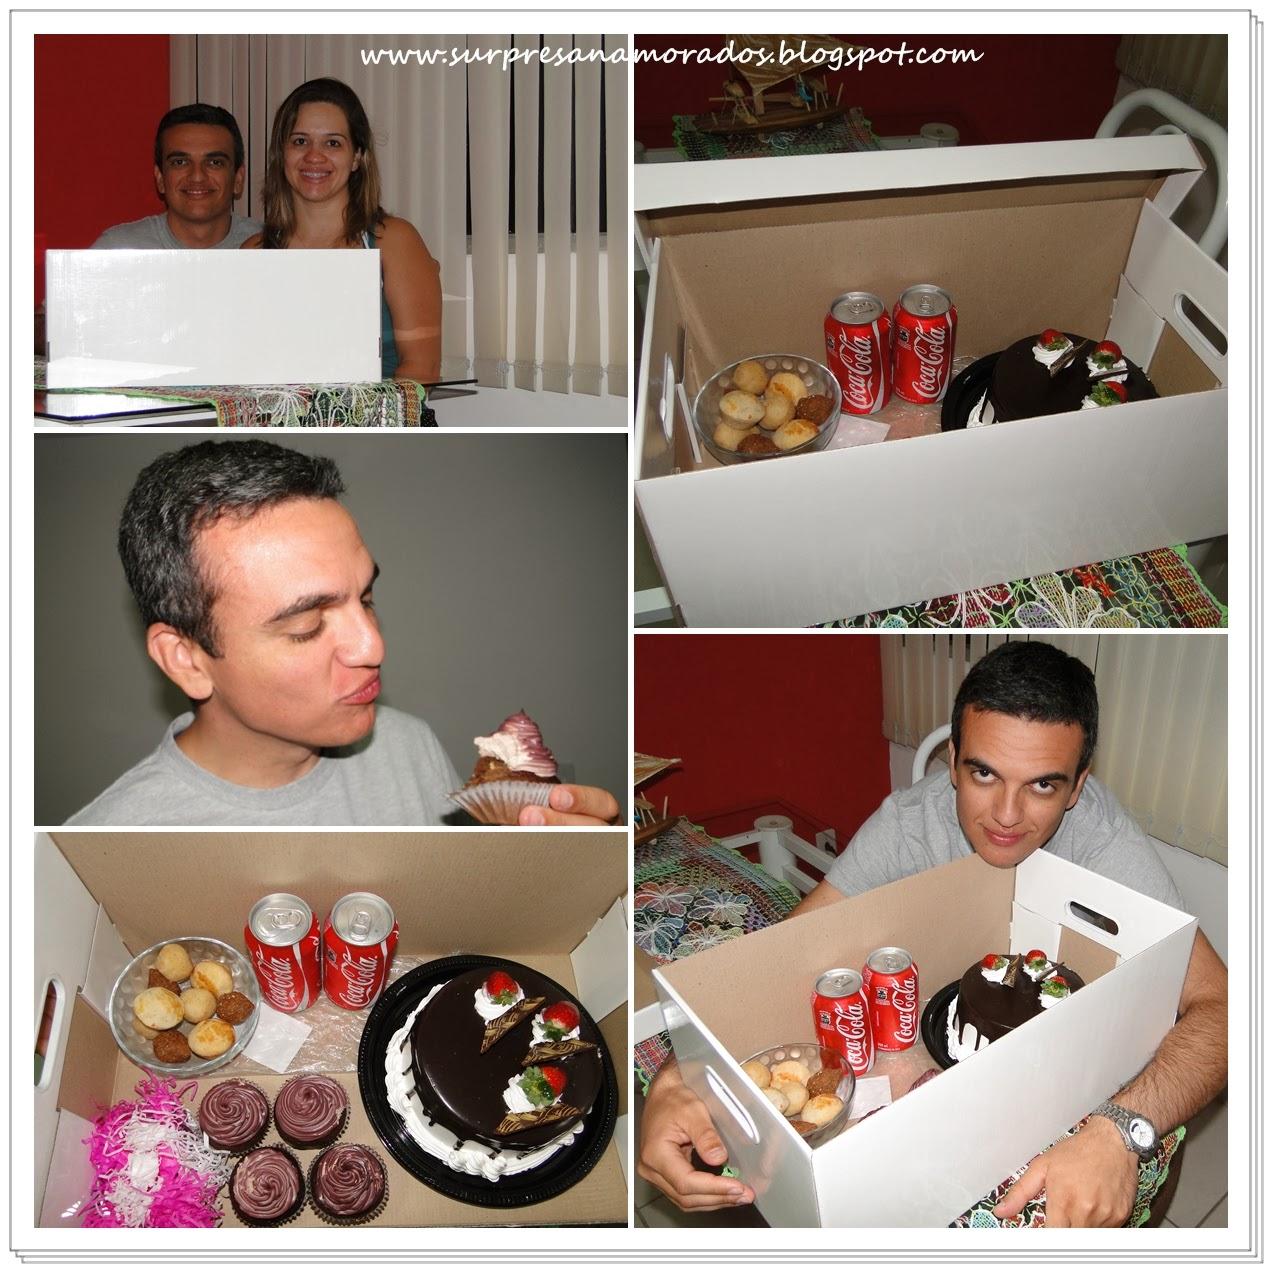 Suficiente Festa na caixa para o namorado | Surpresas para Namorados VB55